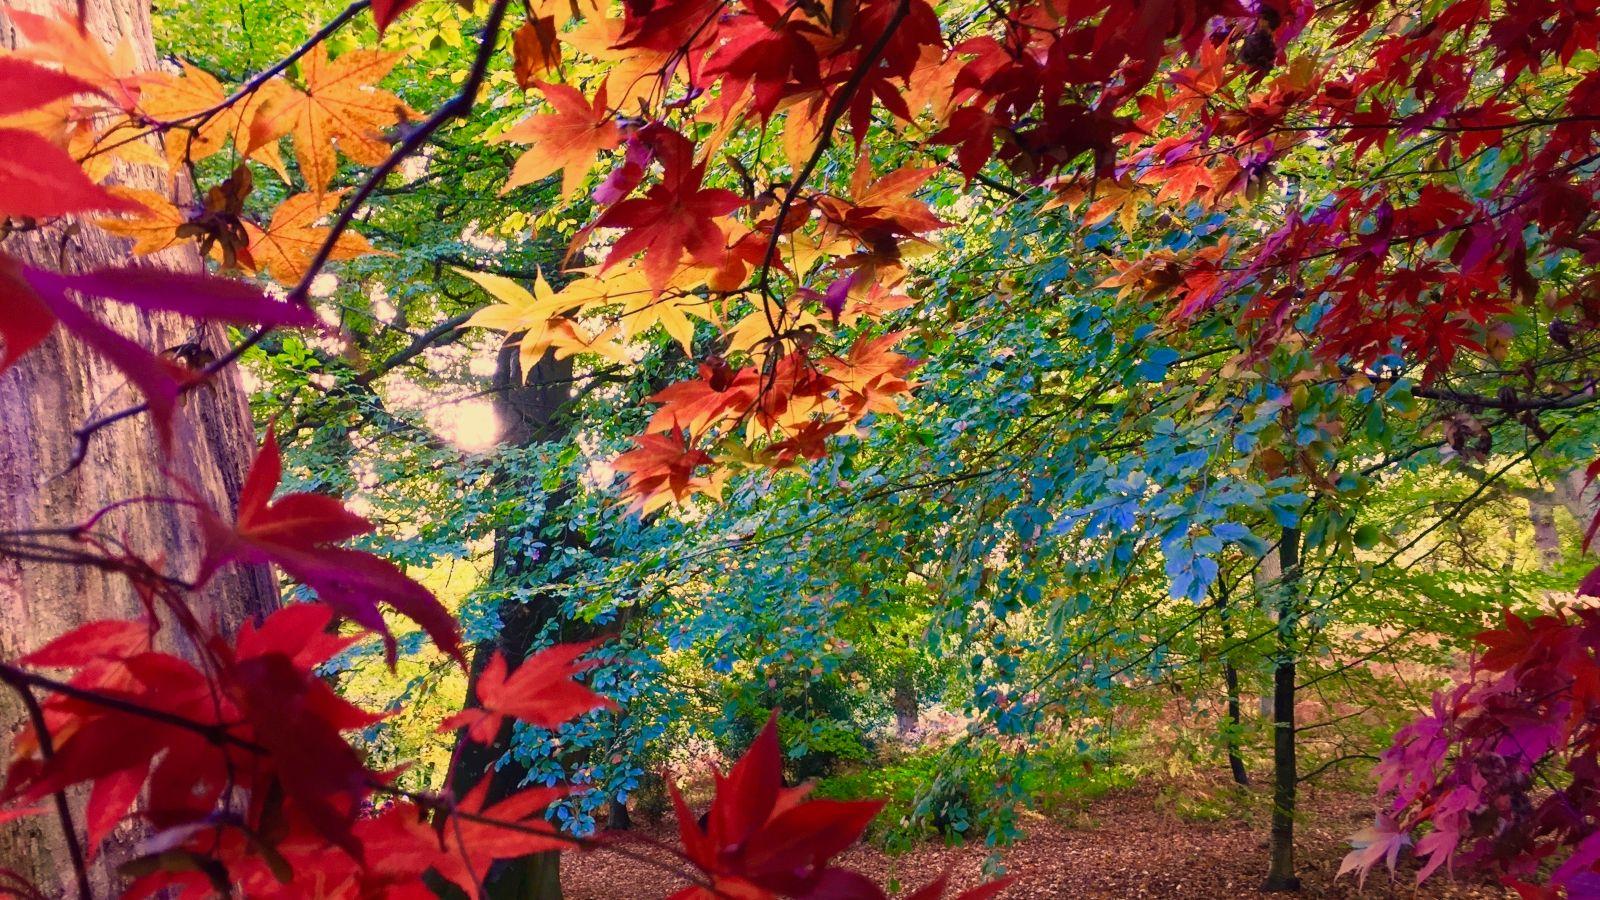 Winkworth arboretum